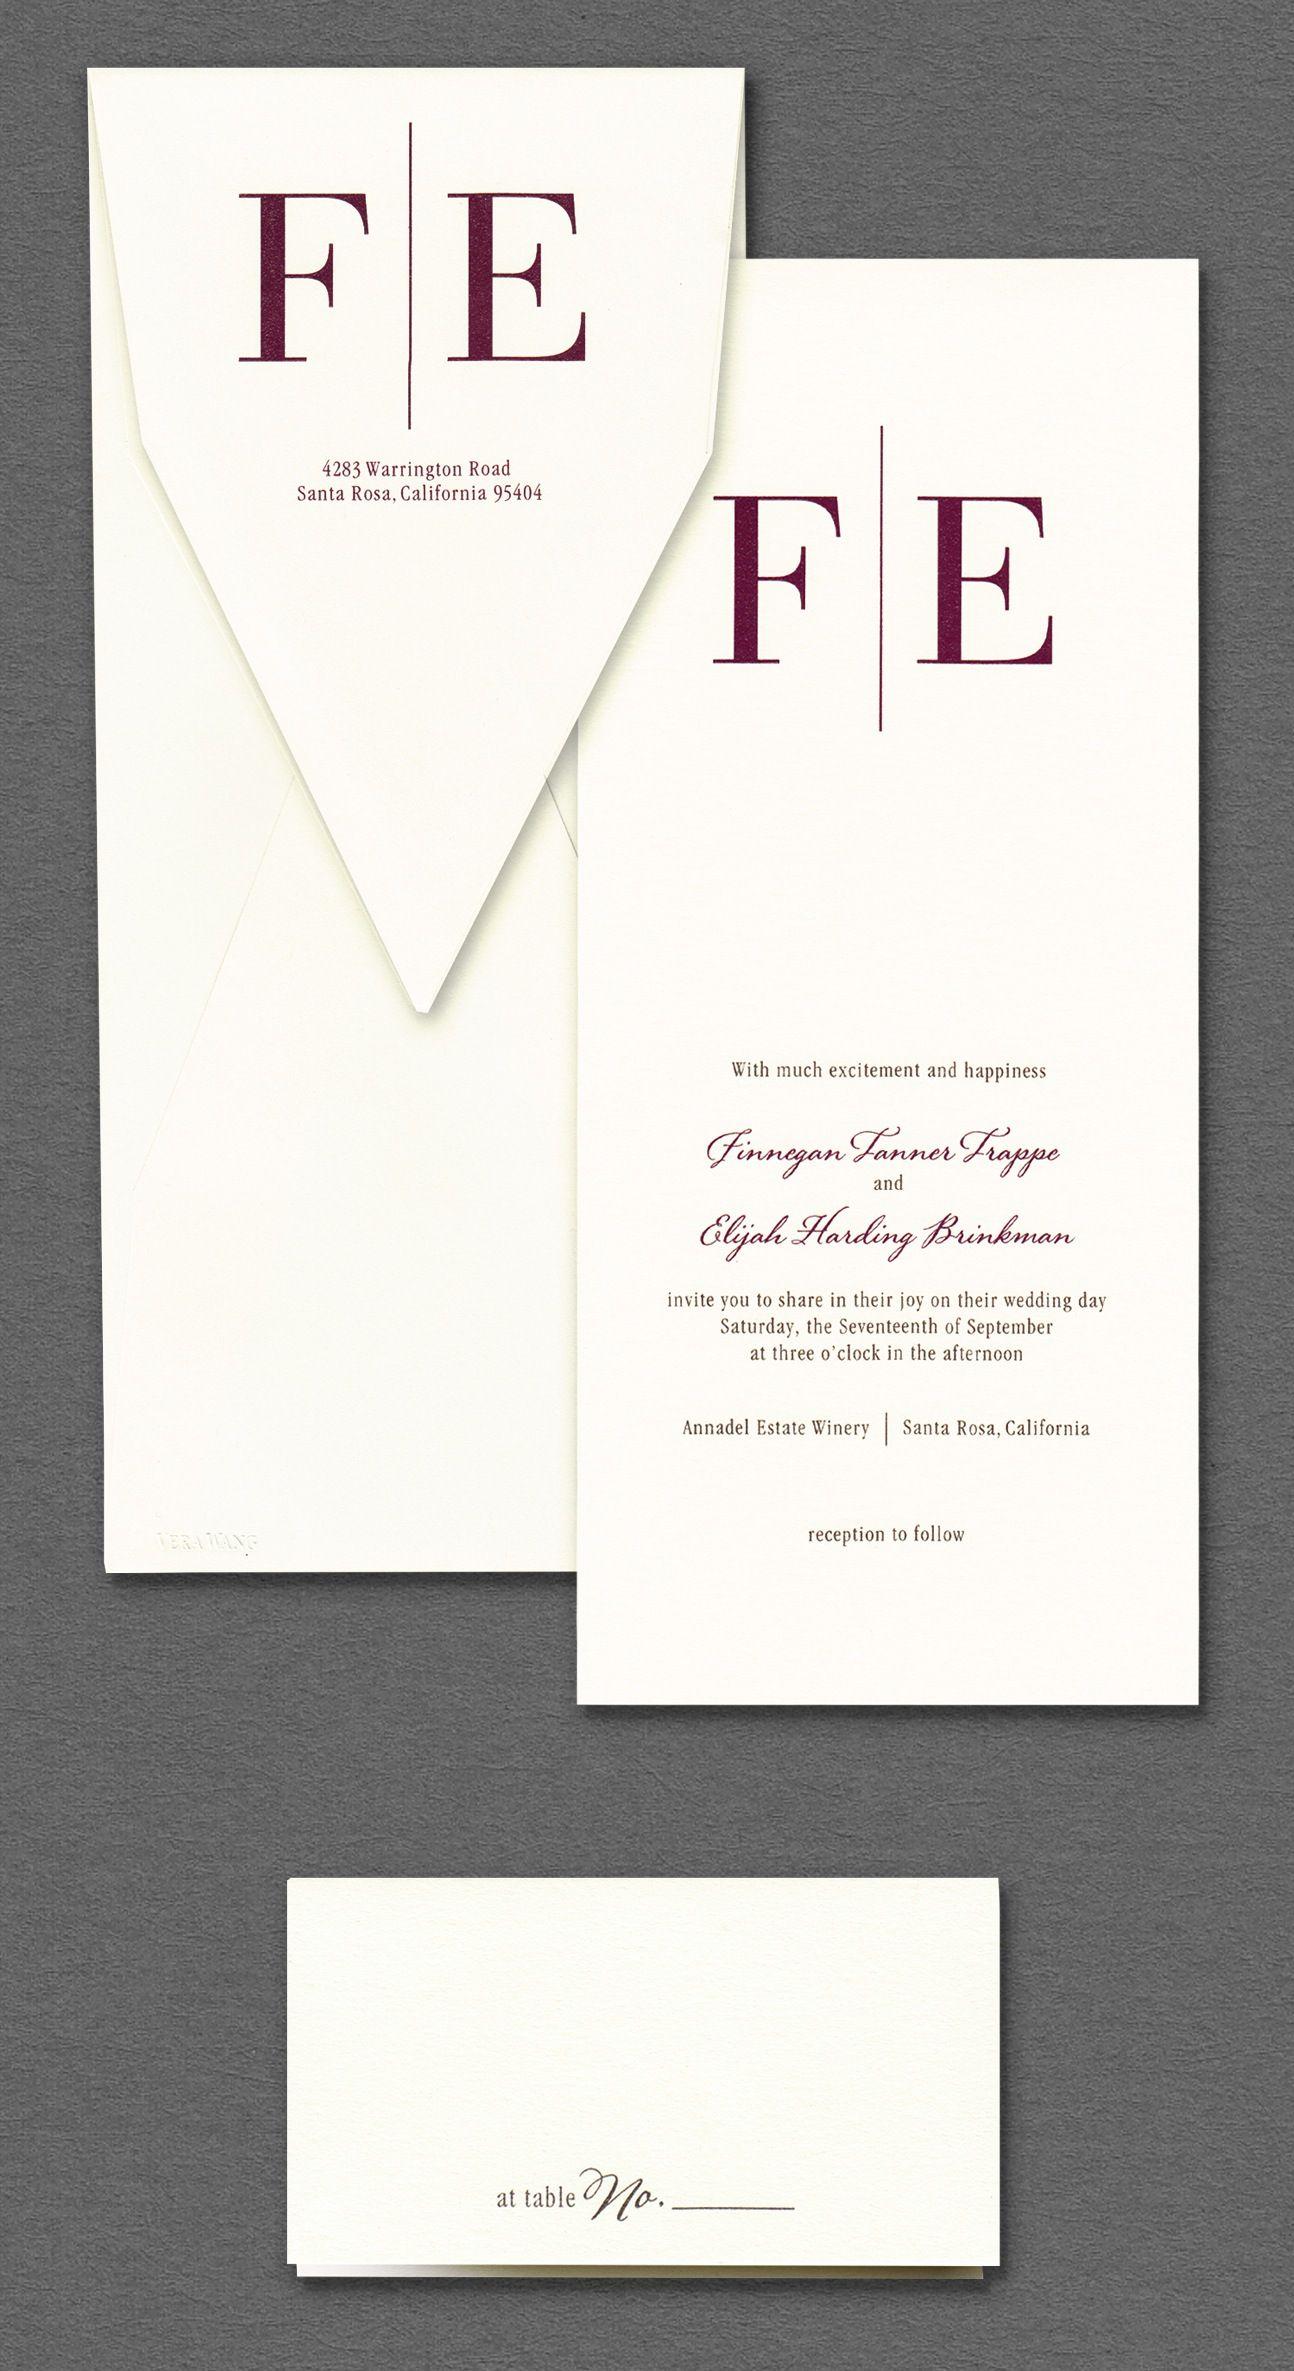 Vera Wang Wedding Invitations | Vera Wang Rectangular Monogram Wedding Invitation Available At Honey